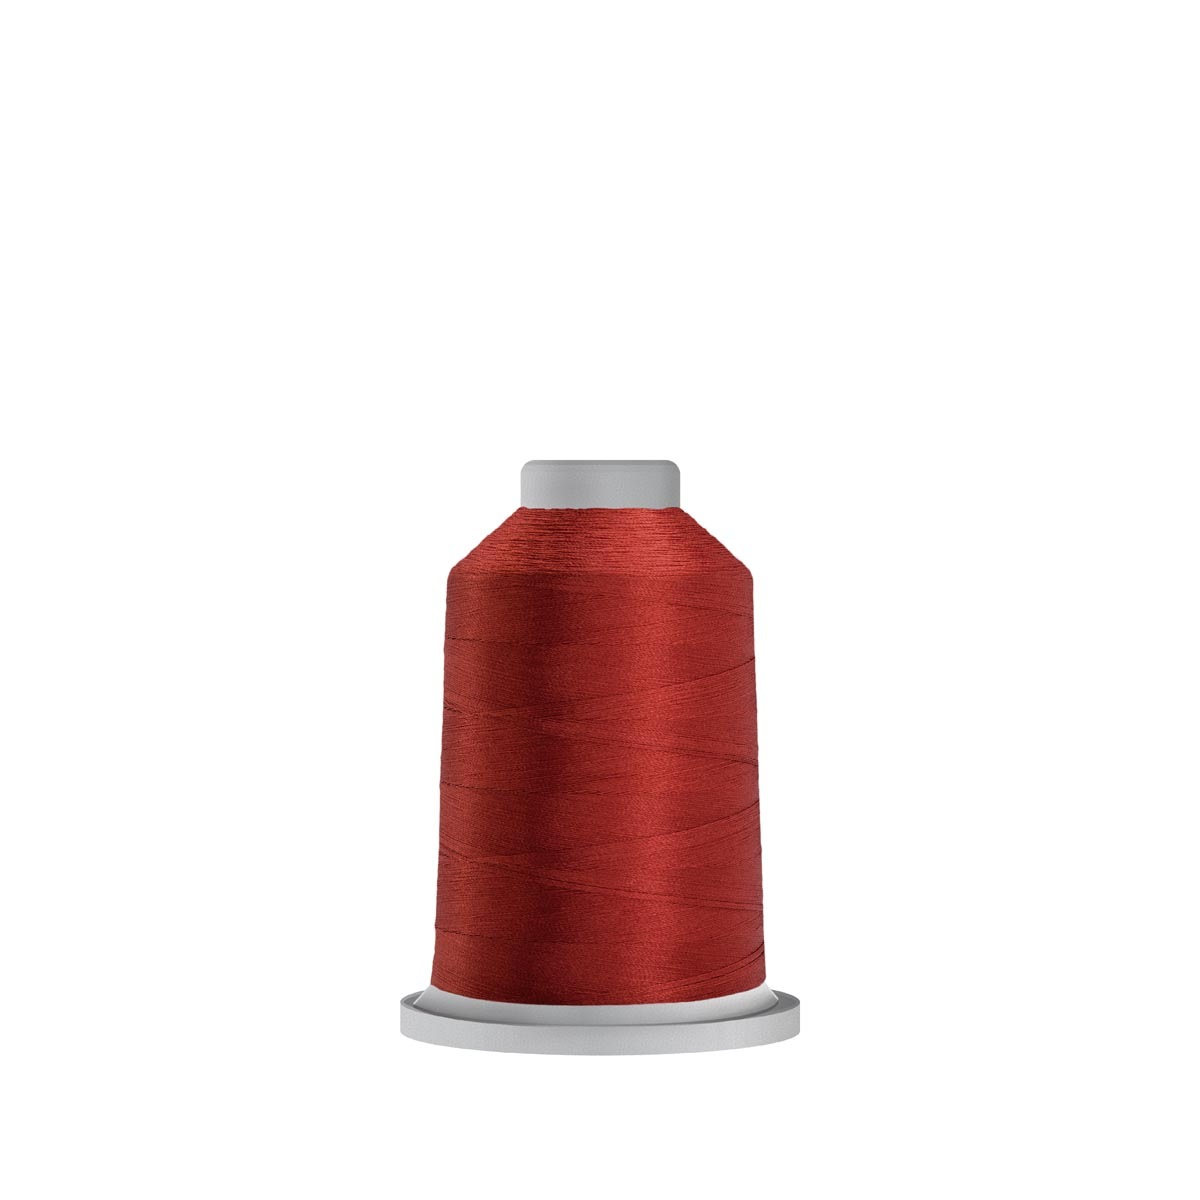 Glide Trilobal Polyester No. 40 Thread - Tomato